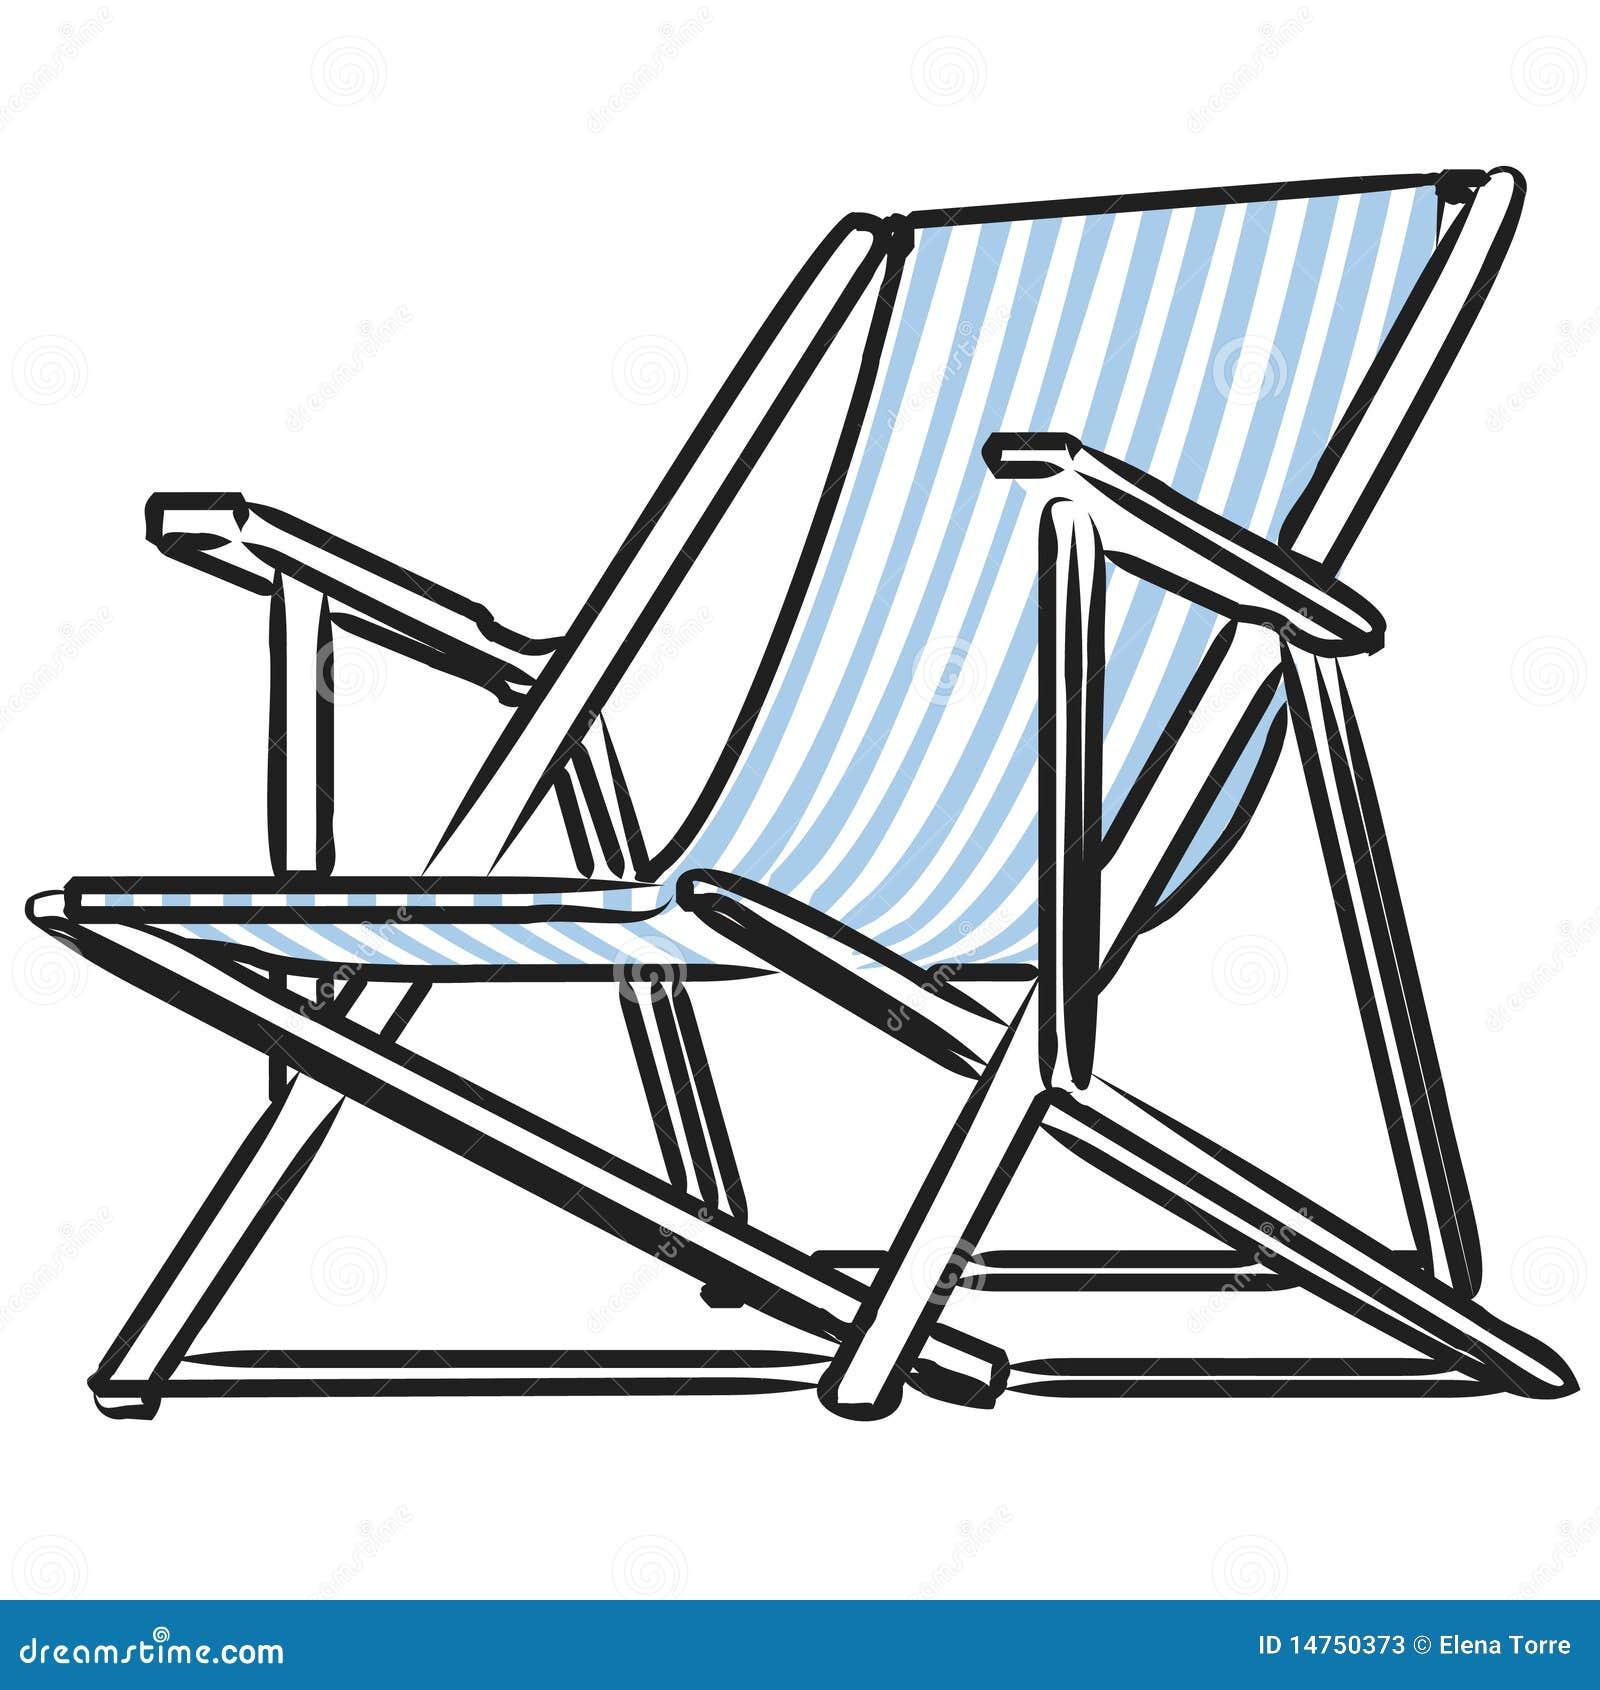 Beach Chair Vector Stock Photos - Image: 14750373